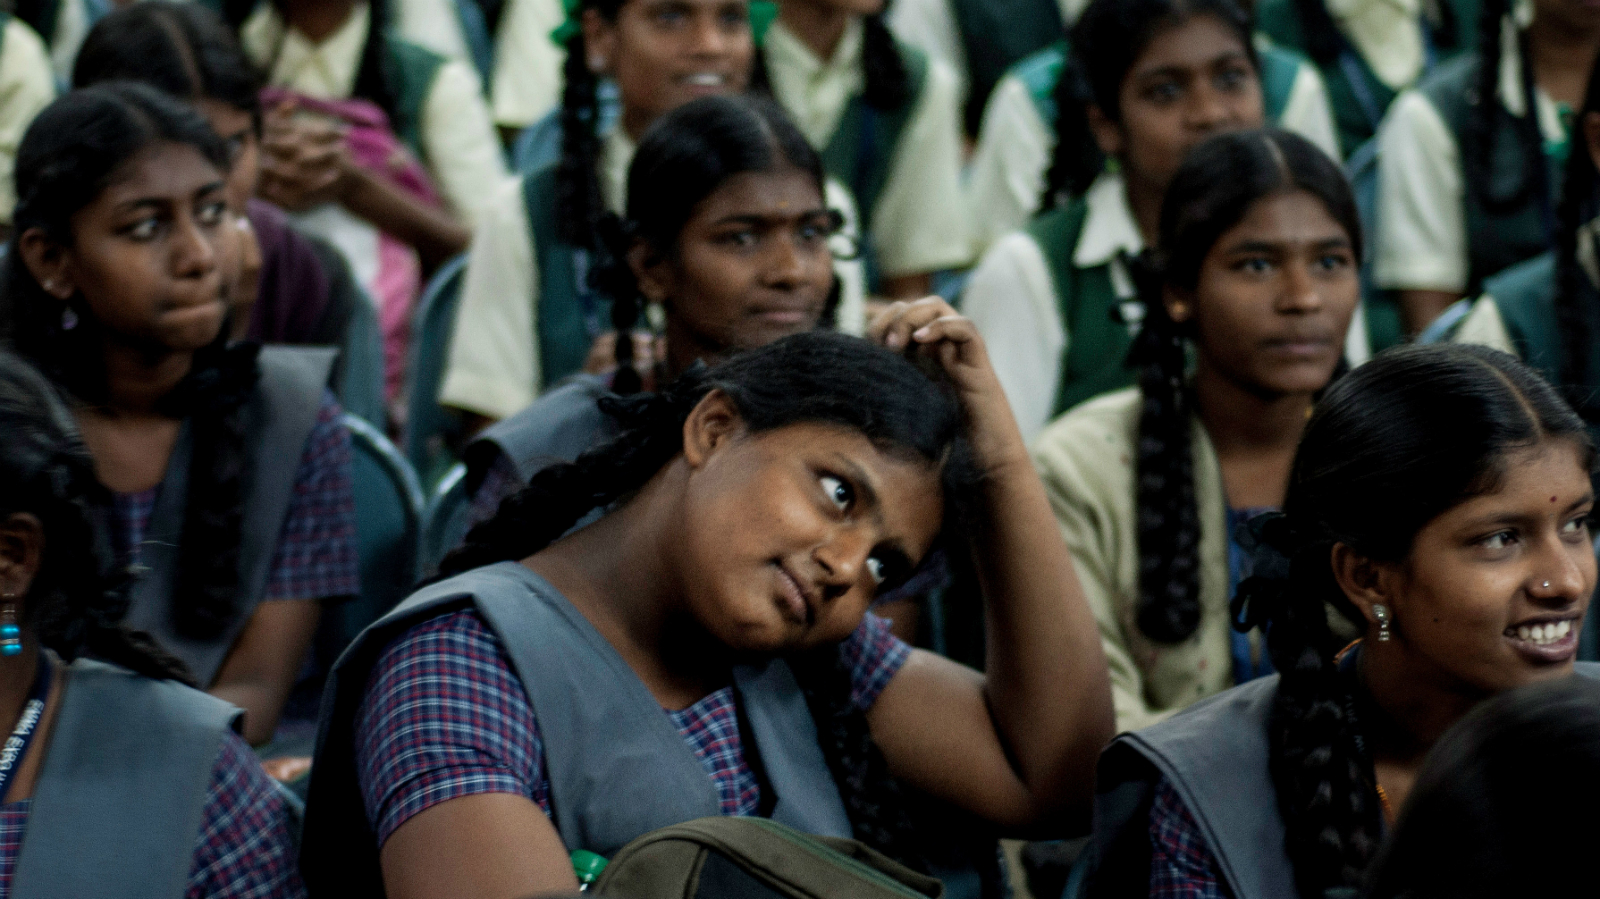 gratuit indien adolescent sexe com